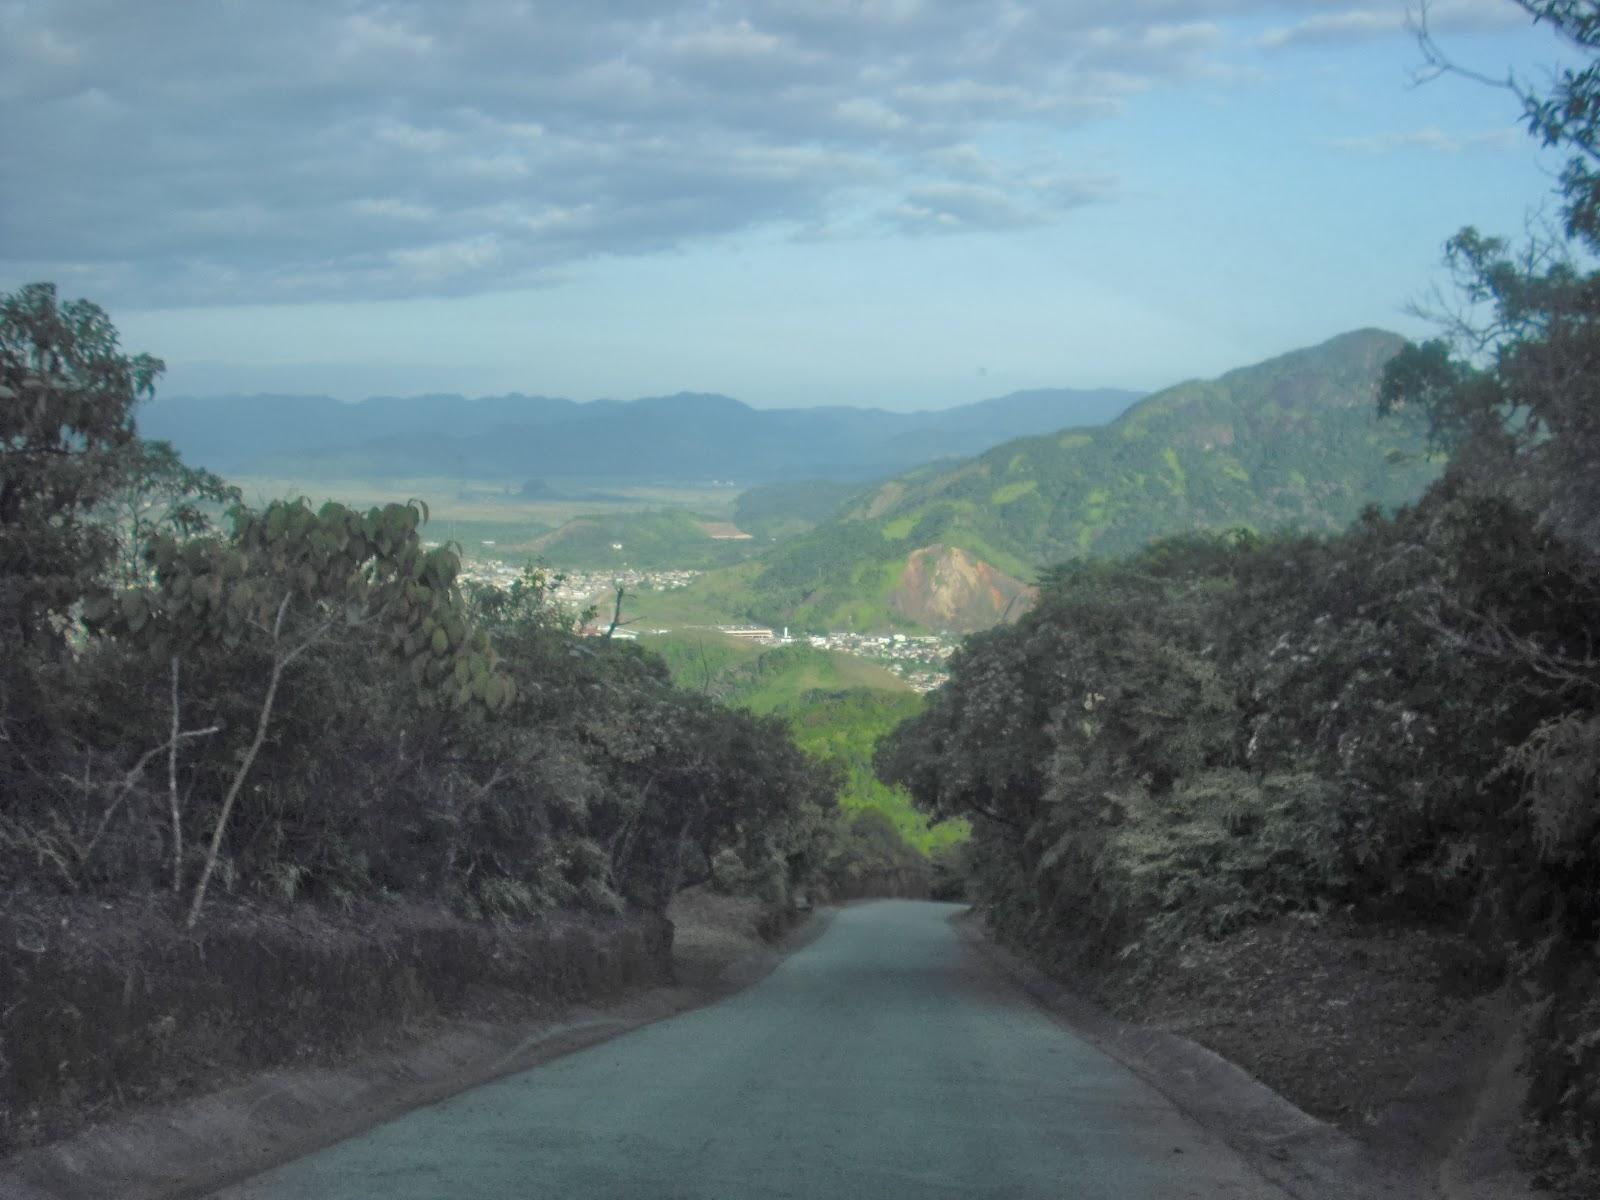 Foto tirada no Morro do Santo Antônio